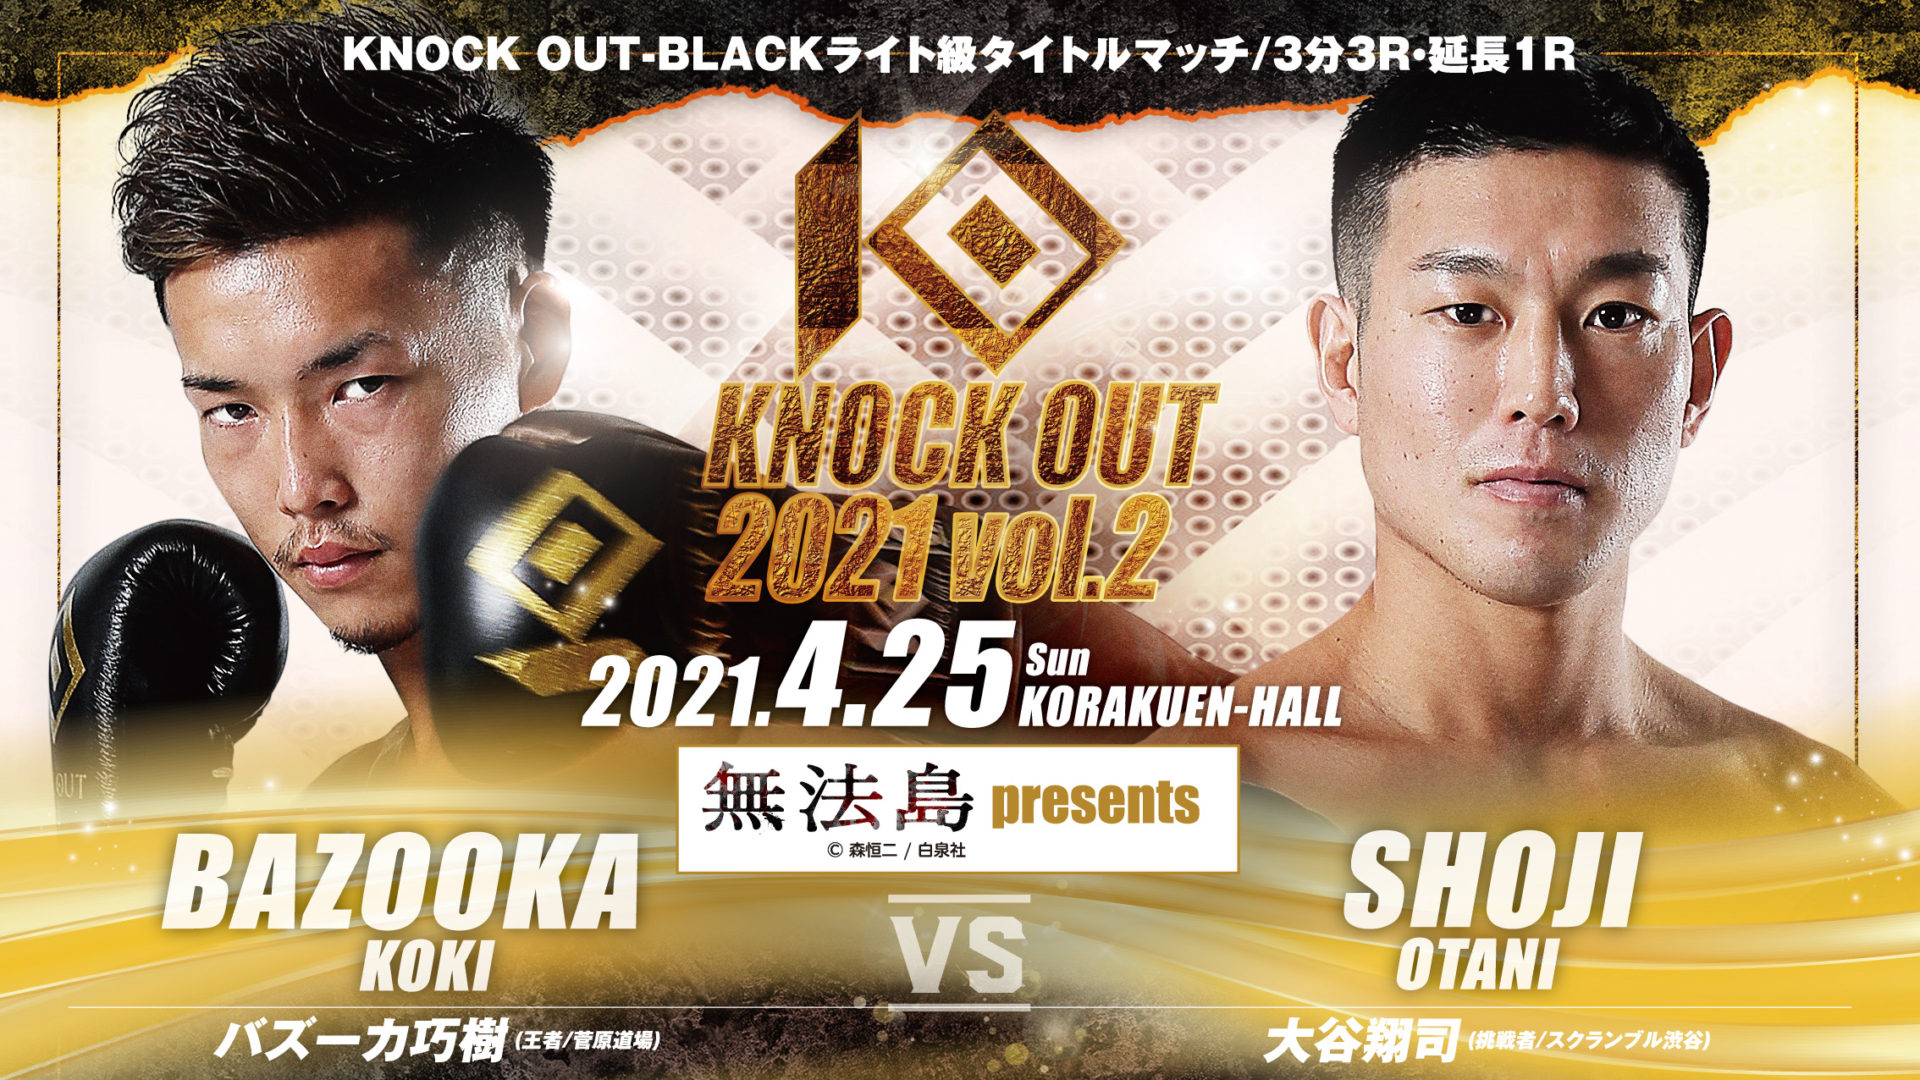 4.25 KNOCK OUT 2021 vol.2|バズーカ巧樹 vs 大谷翔司が「無法島 presents」に決定!